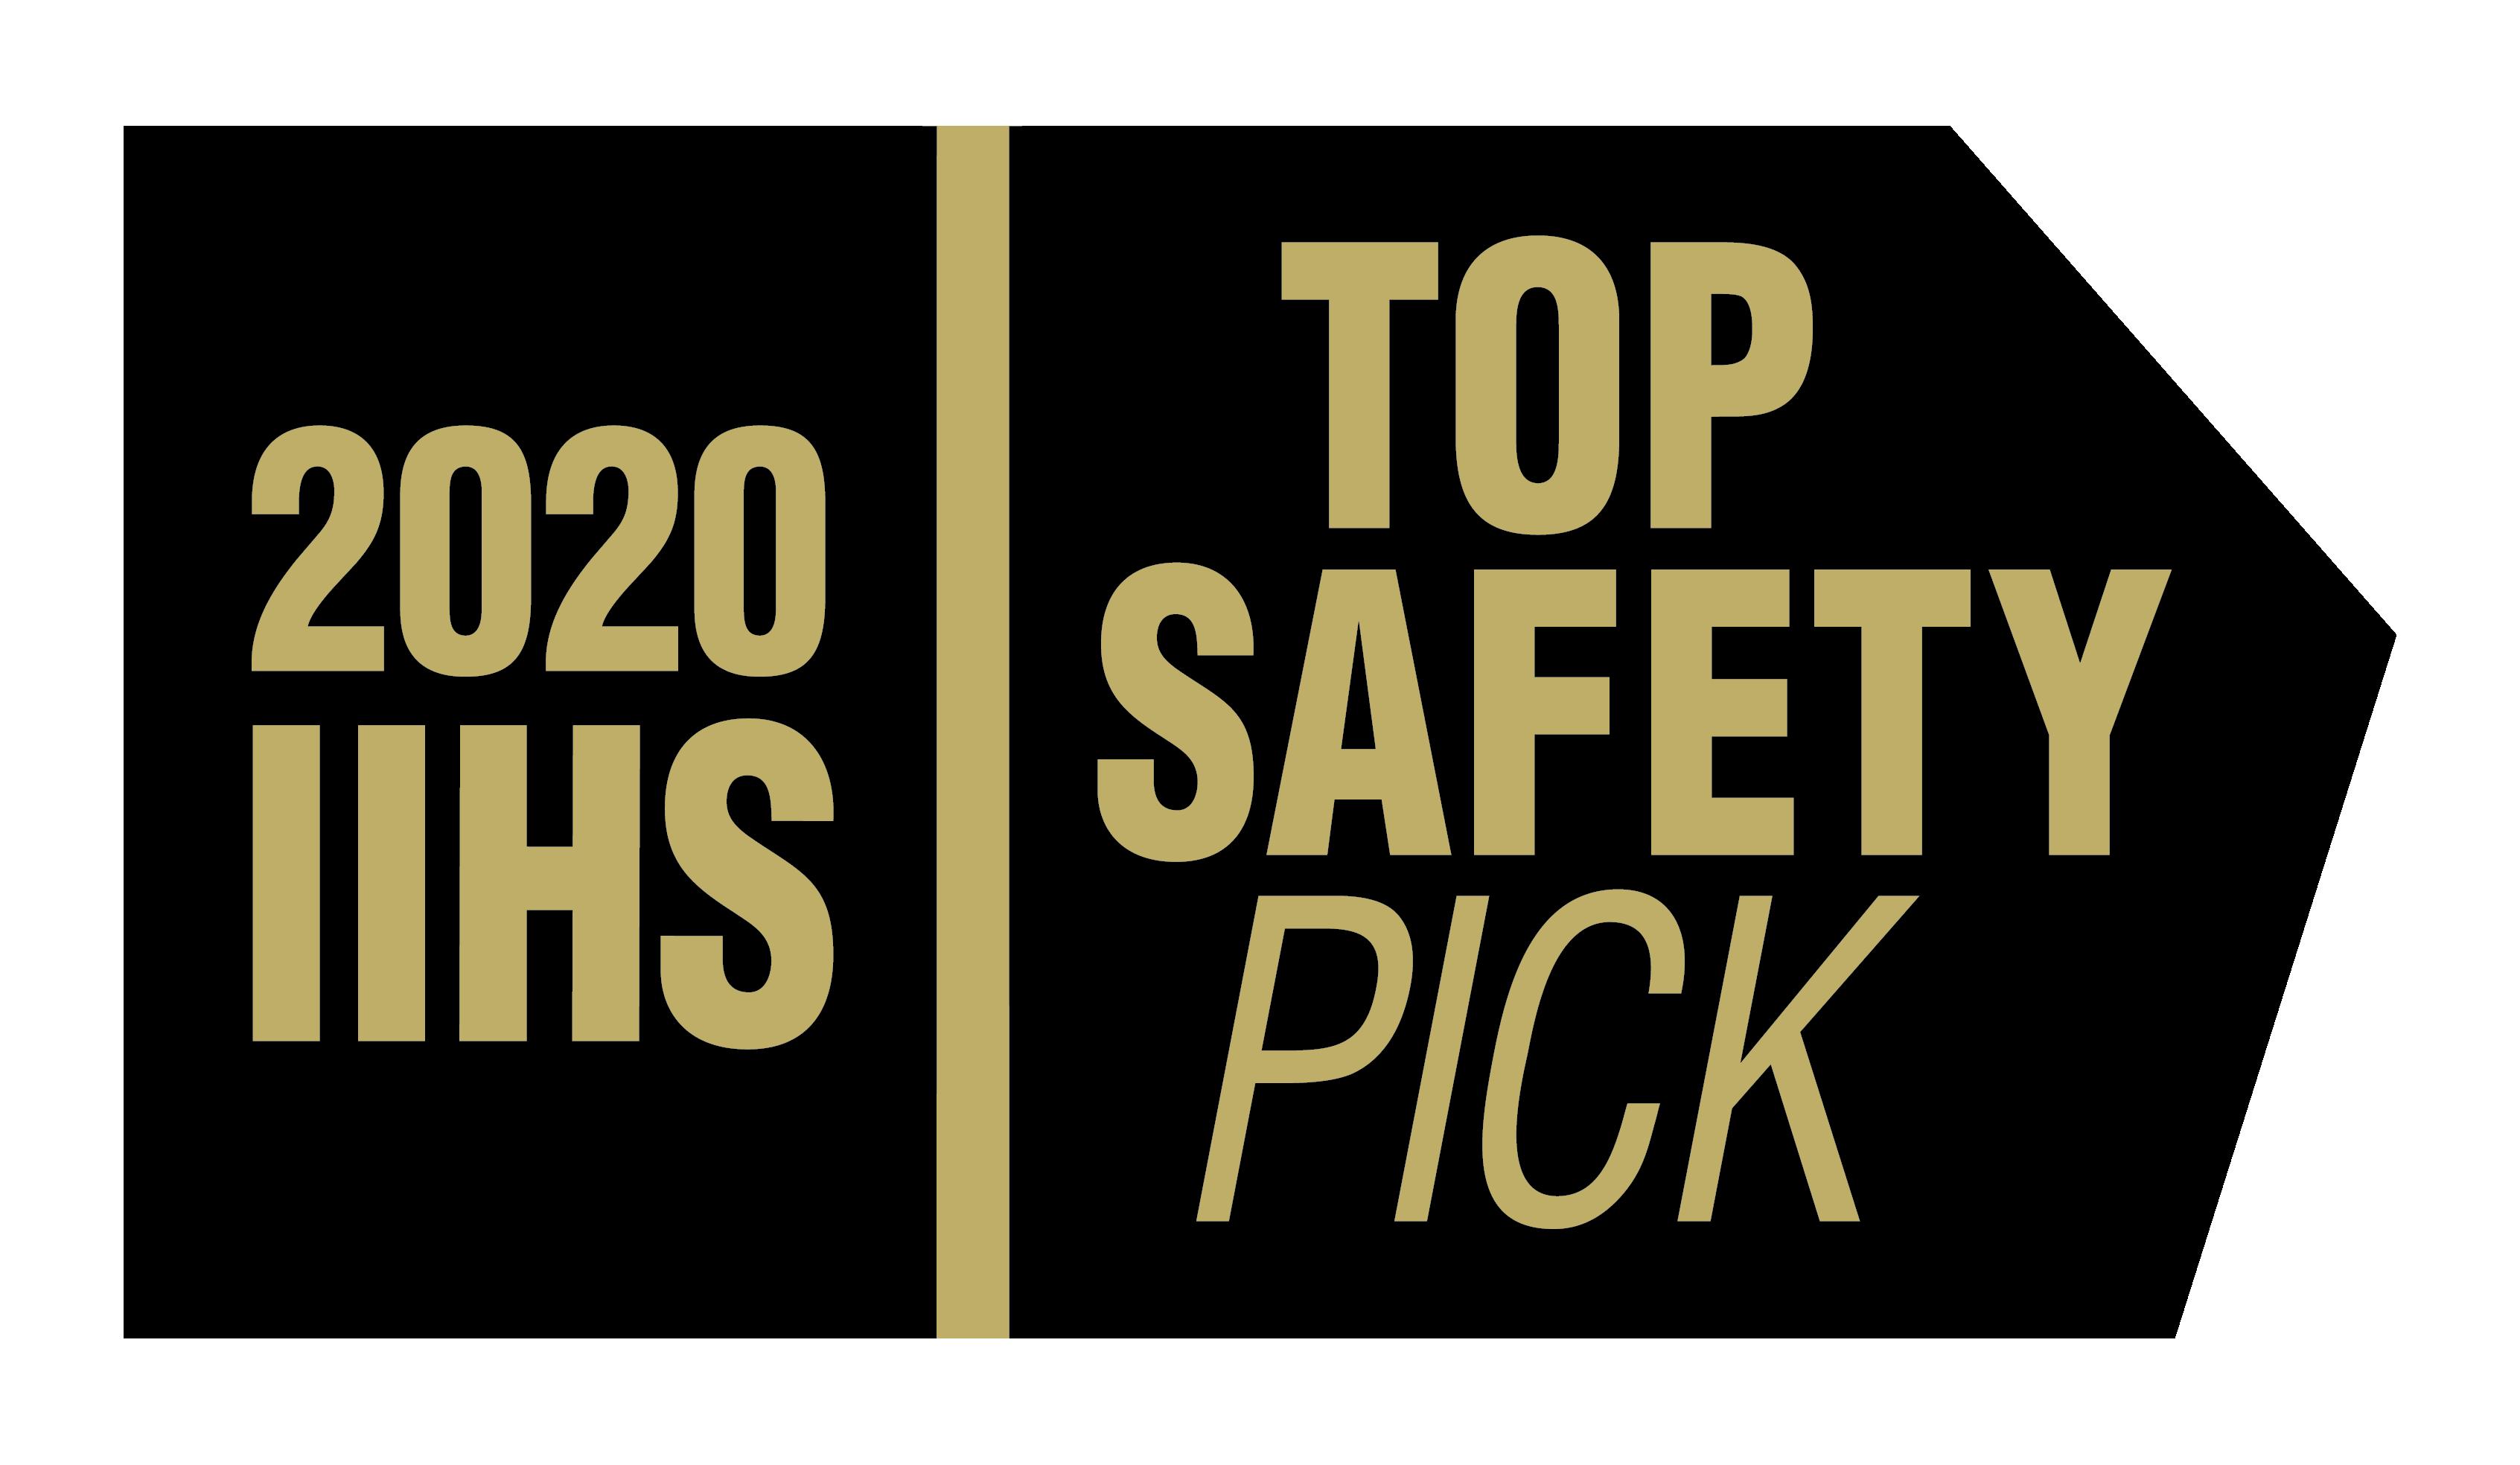 2020 Volvo XC60 S60 IIHS Top Safety Pick